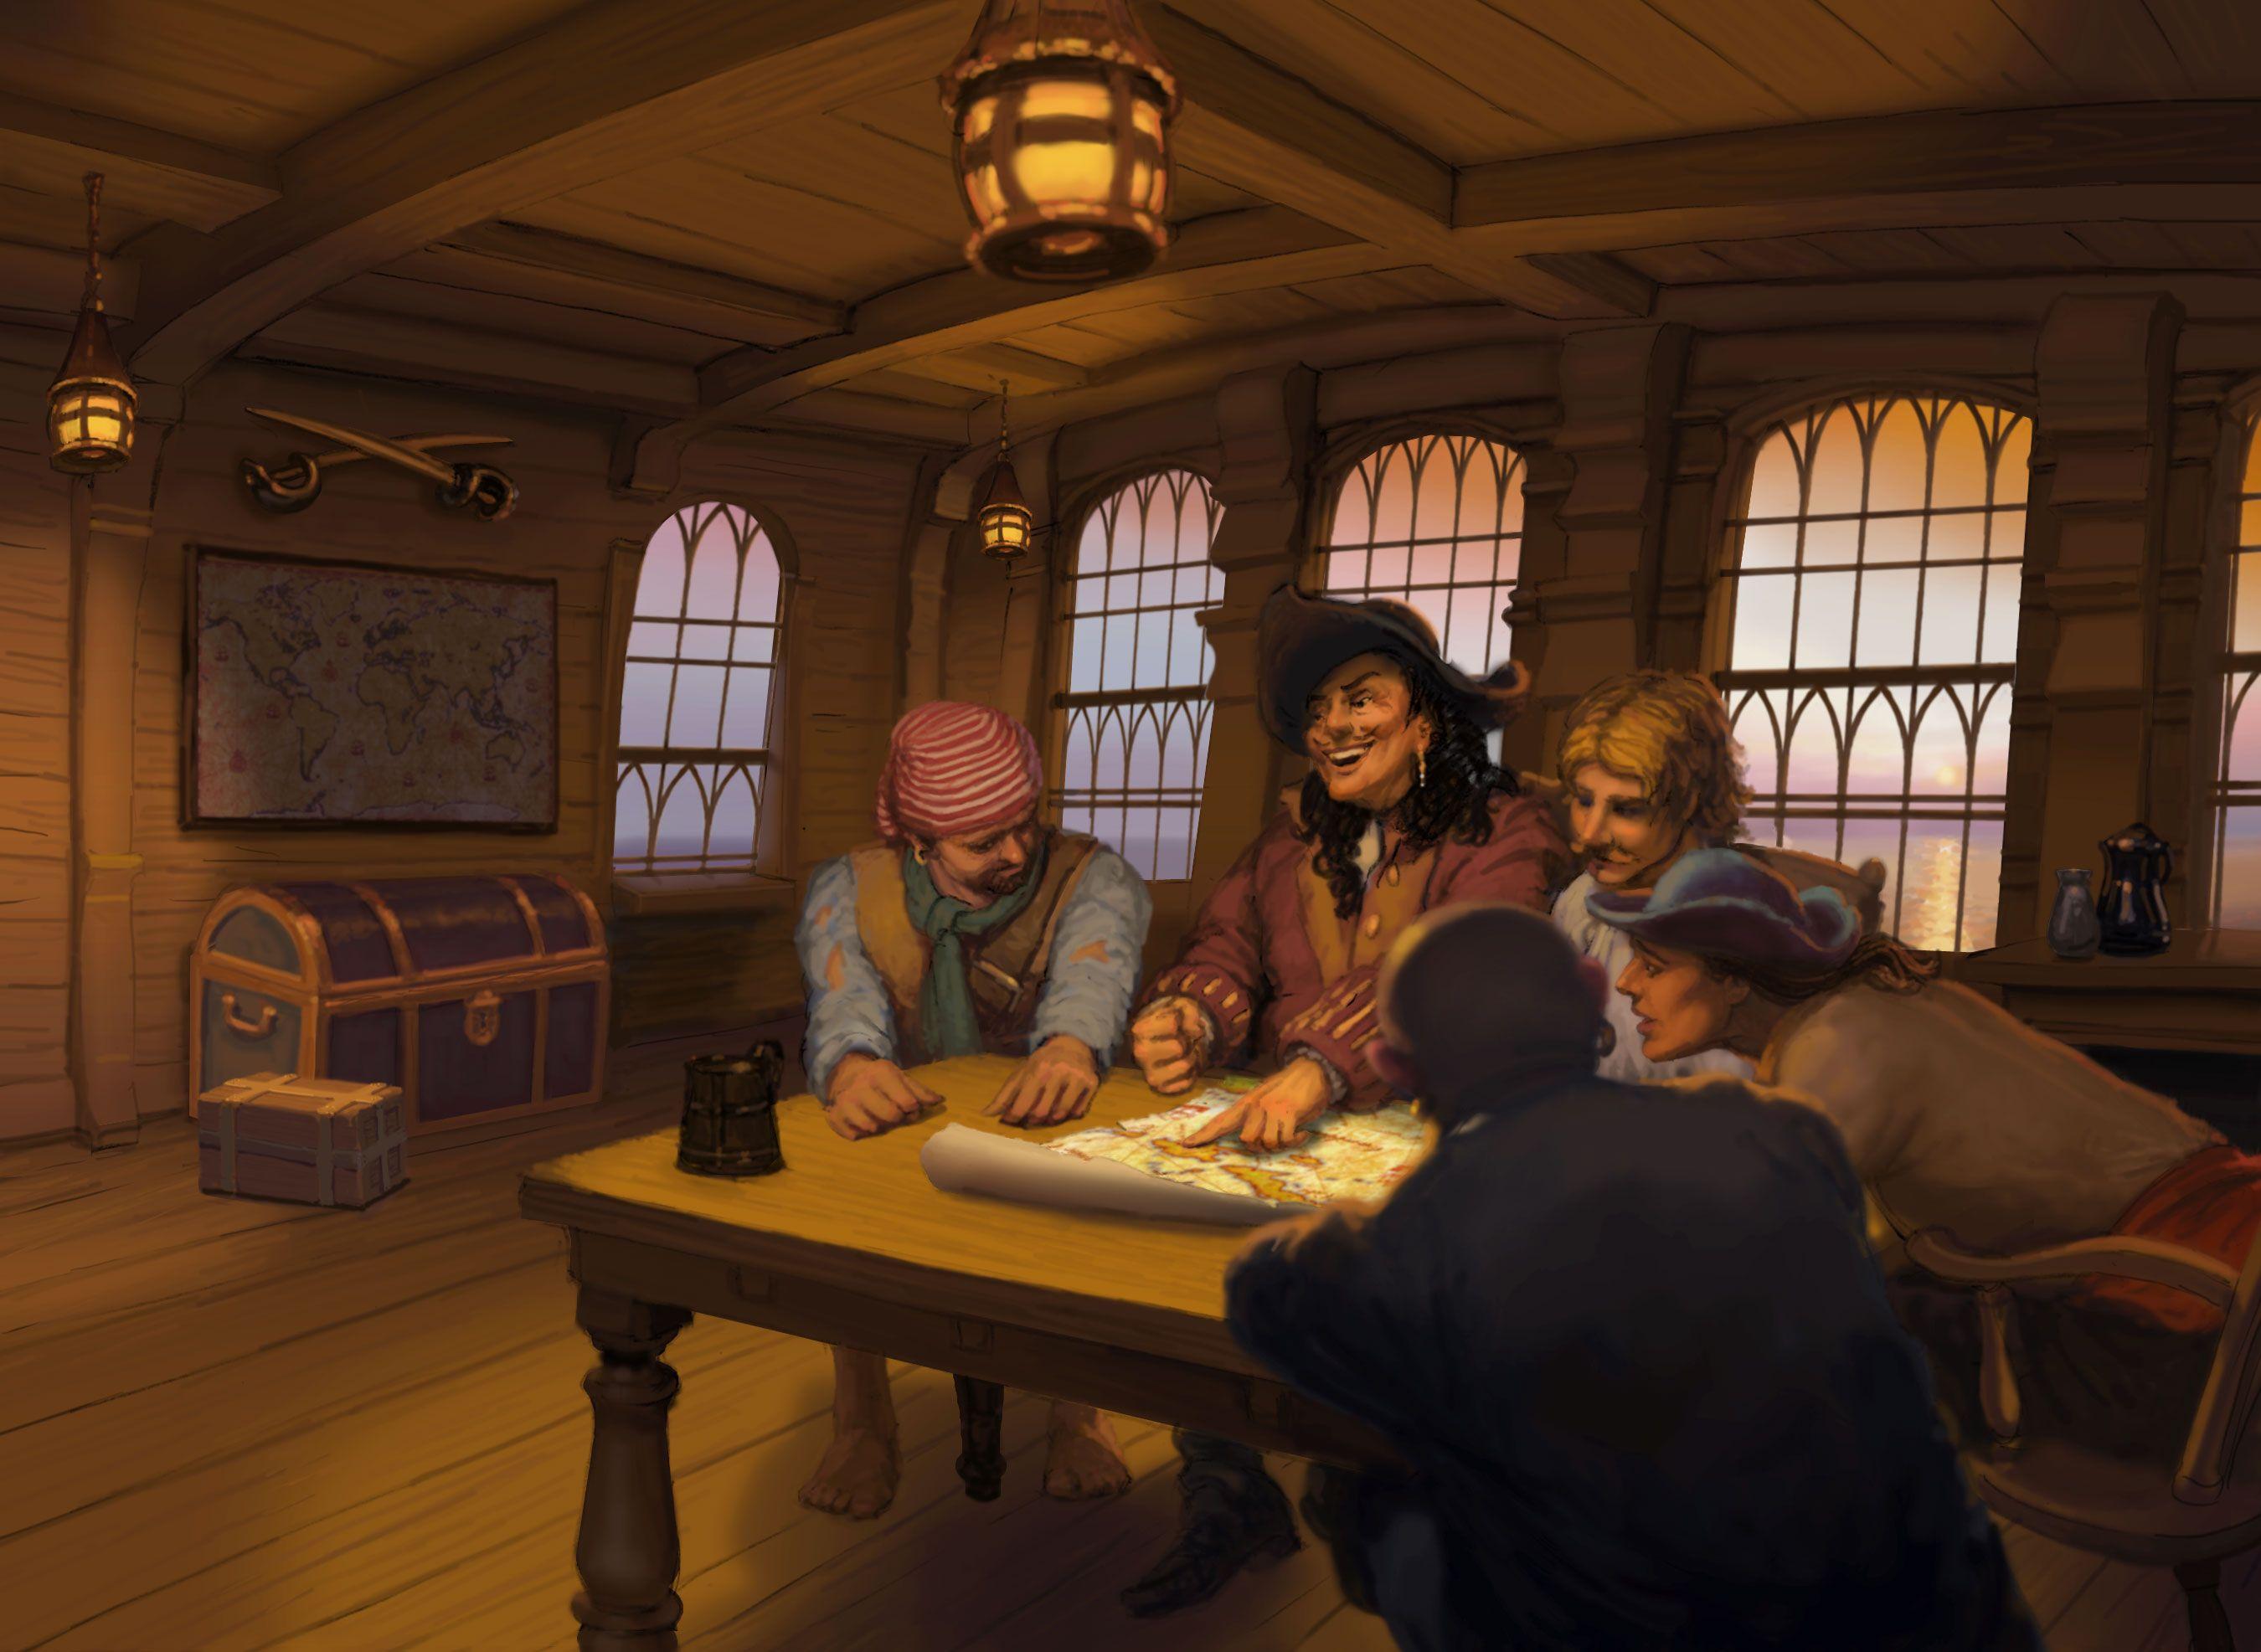 Каюта пиратов картинки